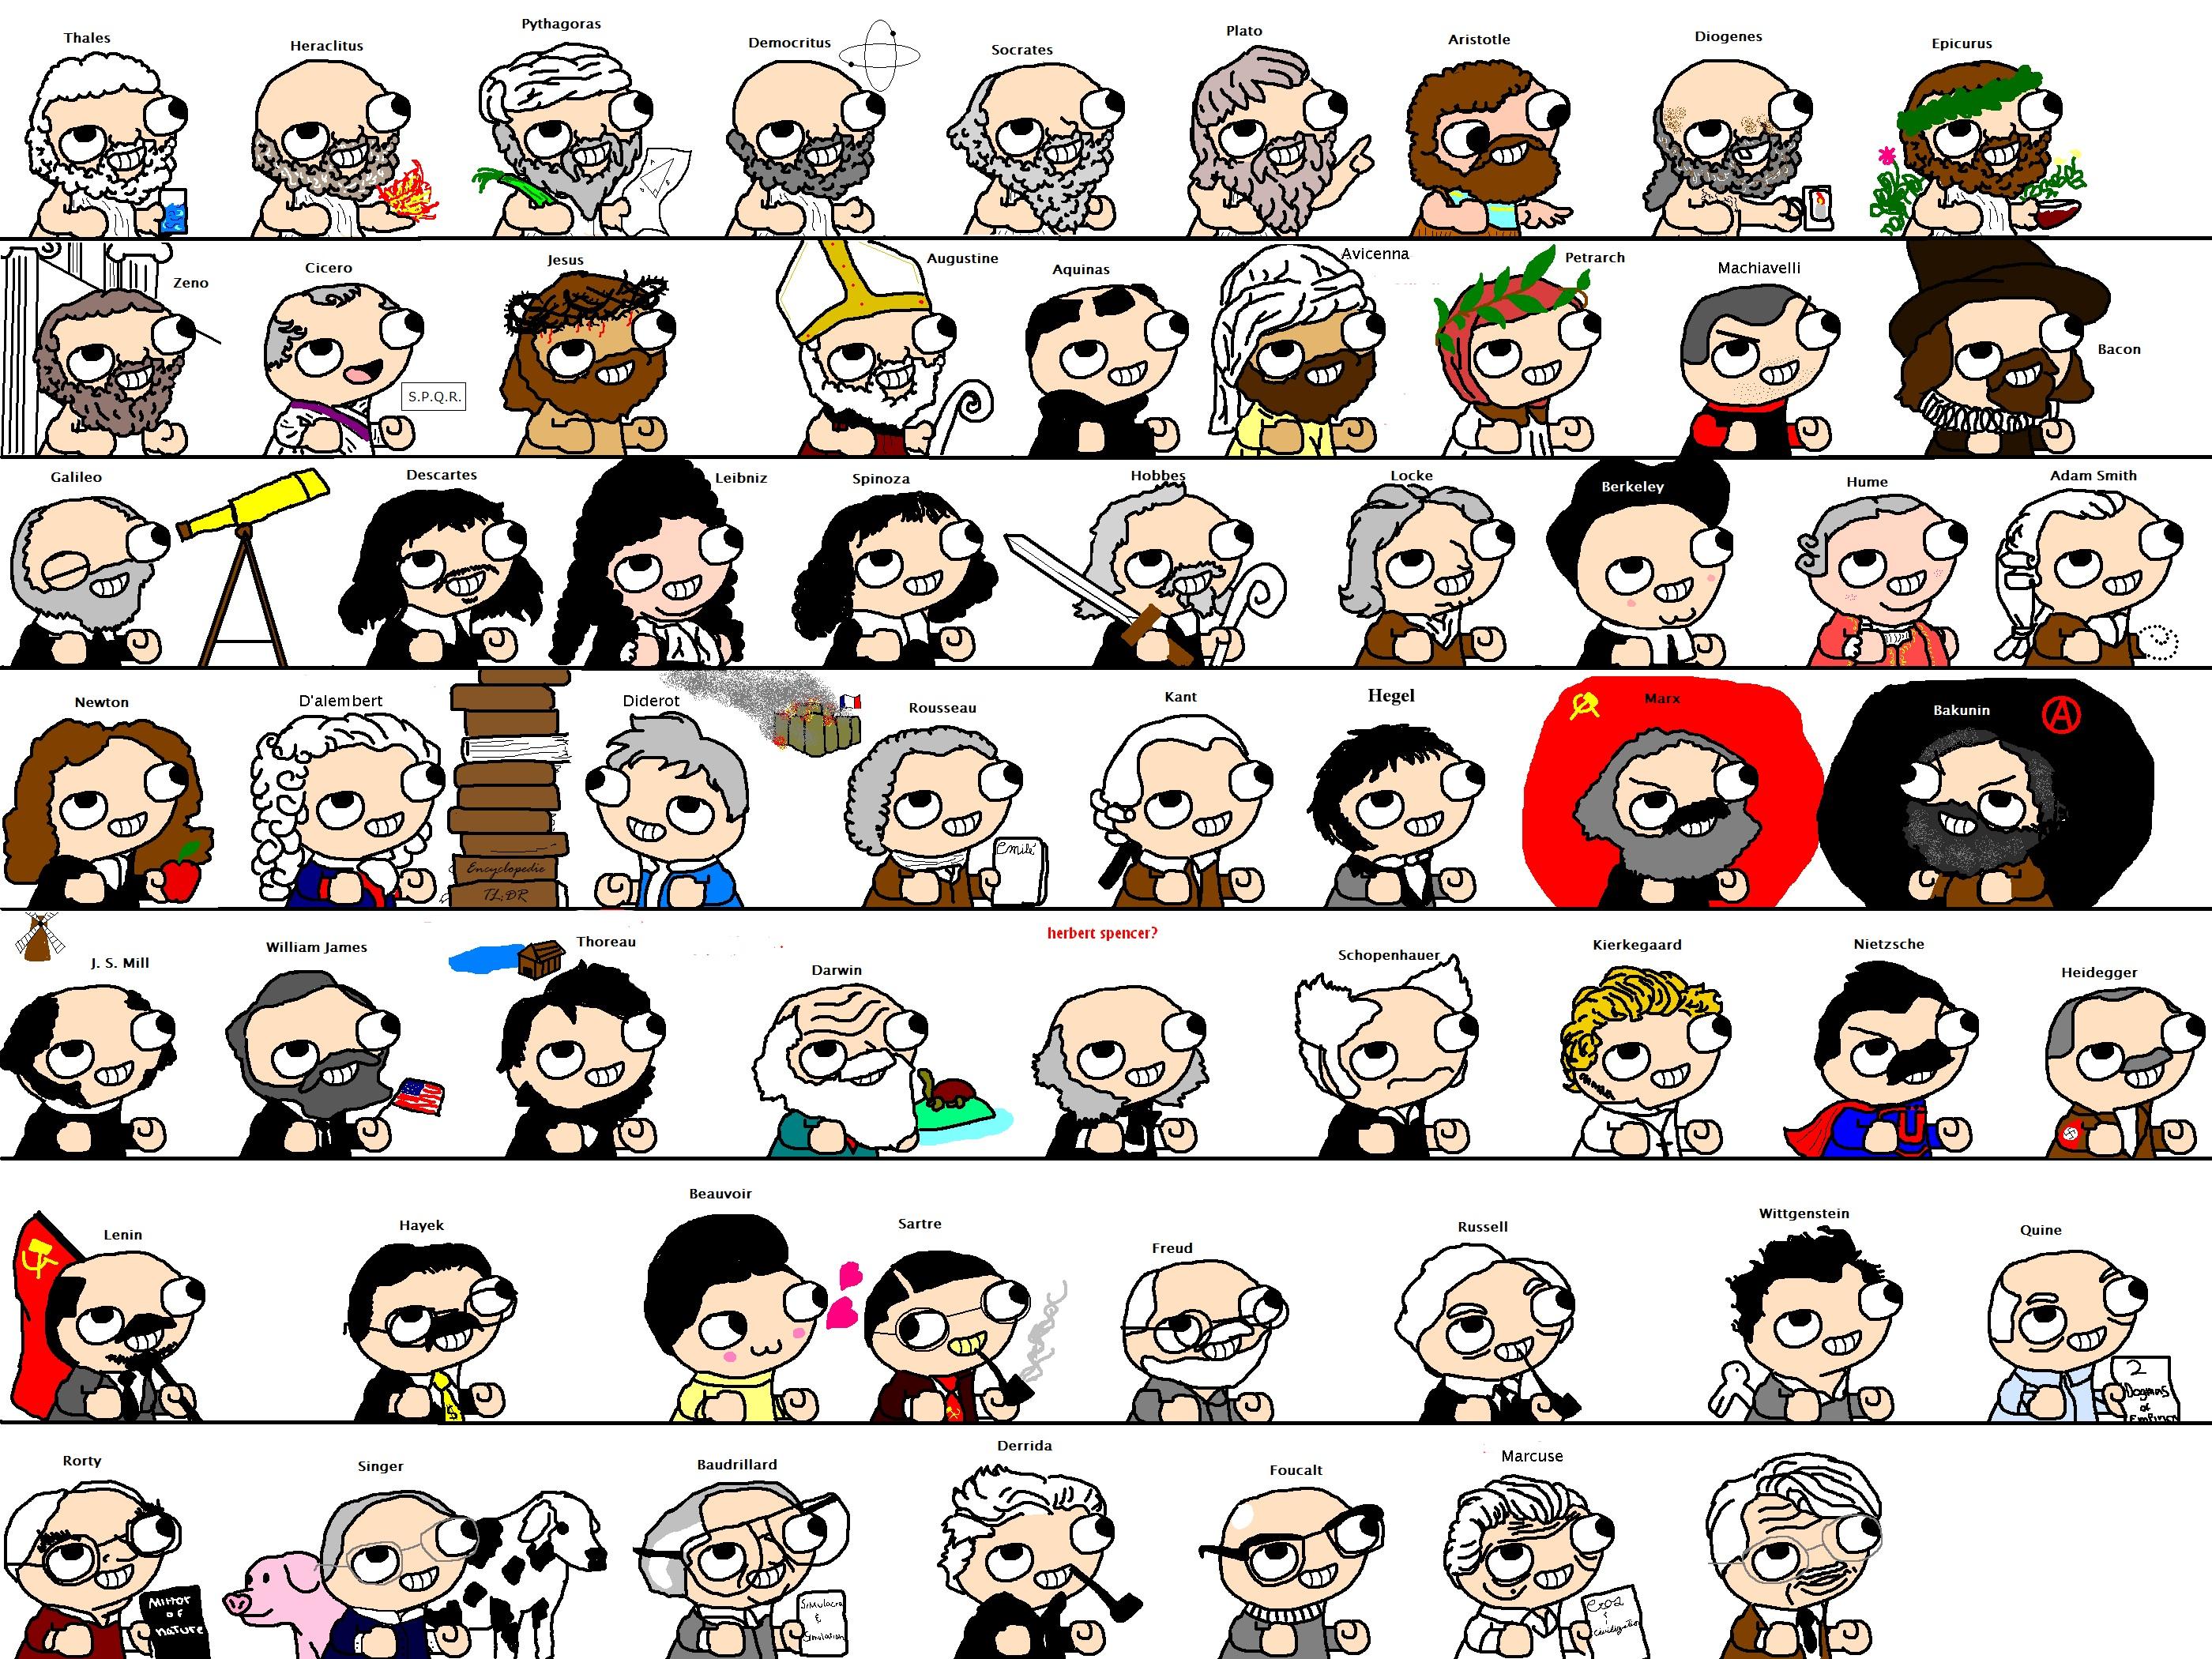 fsjal philosophers | fsjal | Know Your Meme